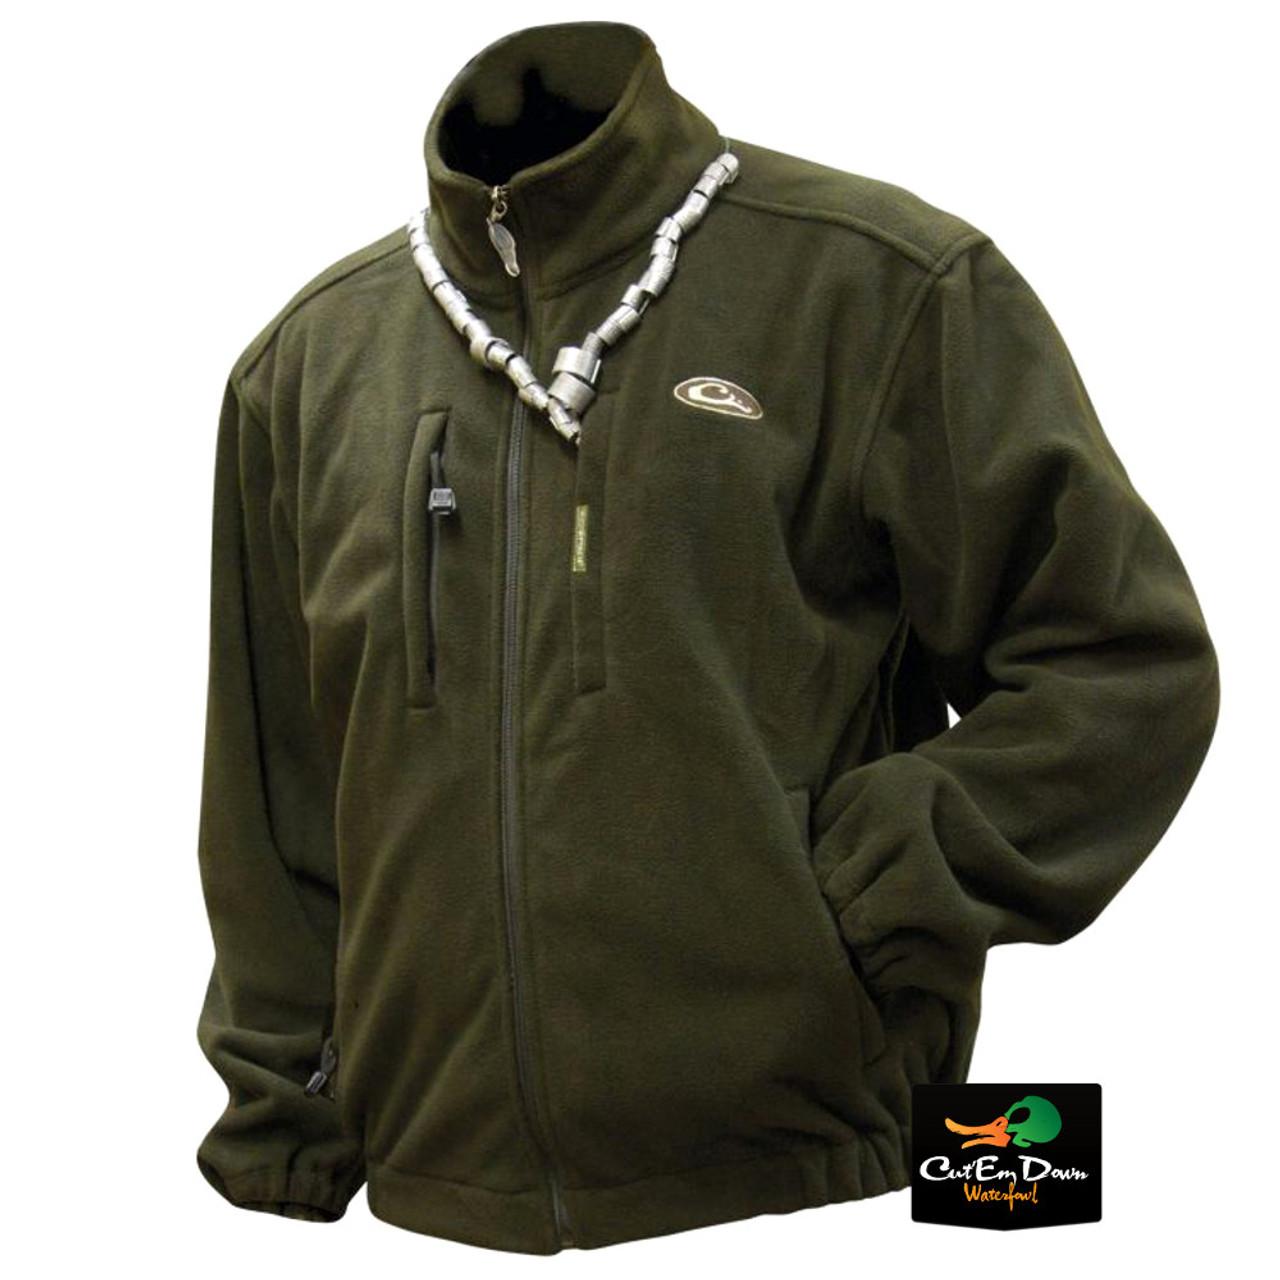 d61e0f6a346c9 Drake Waterfowl MST Windproof Layering Coat